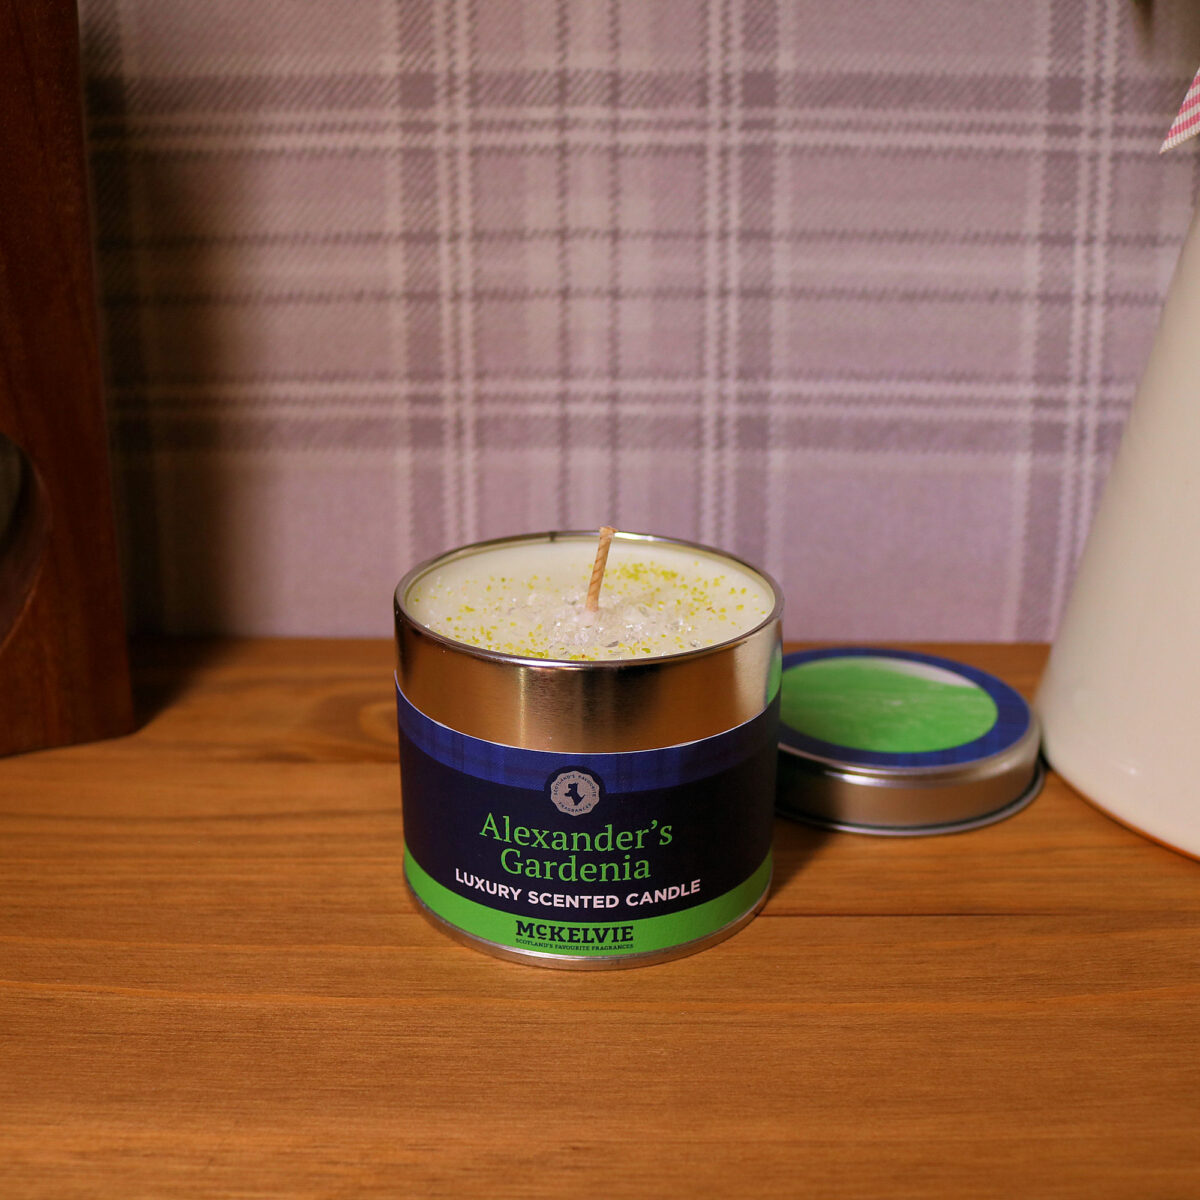 Alexander's Gardenia Scented Candle Tin